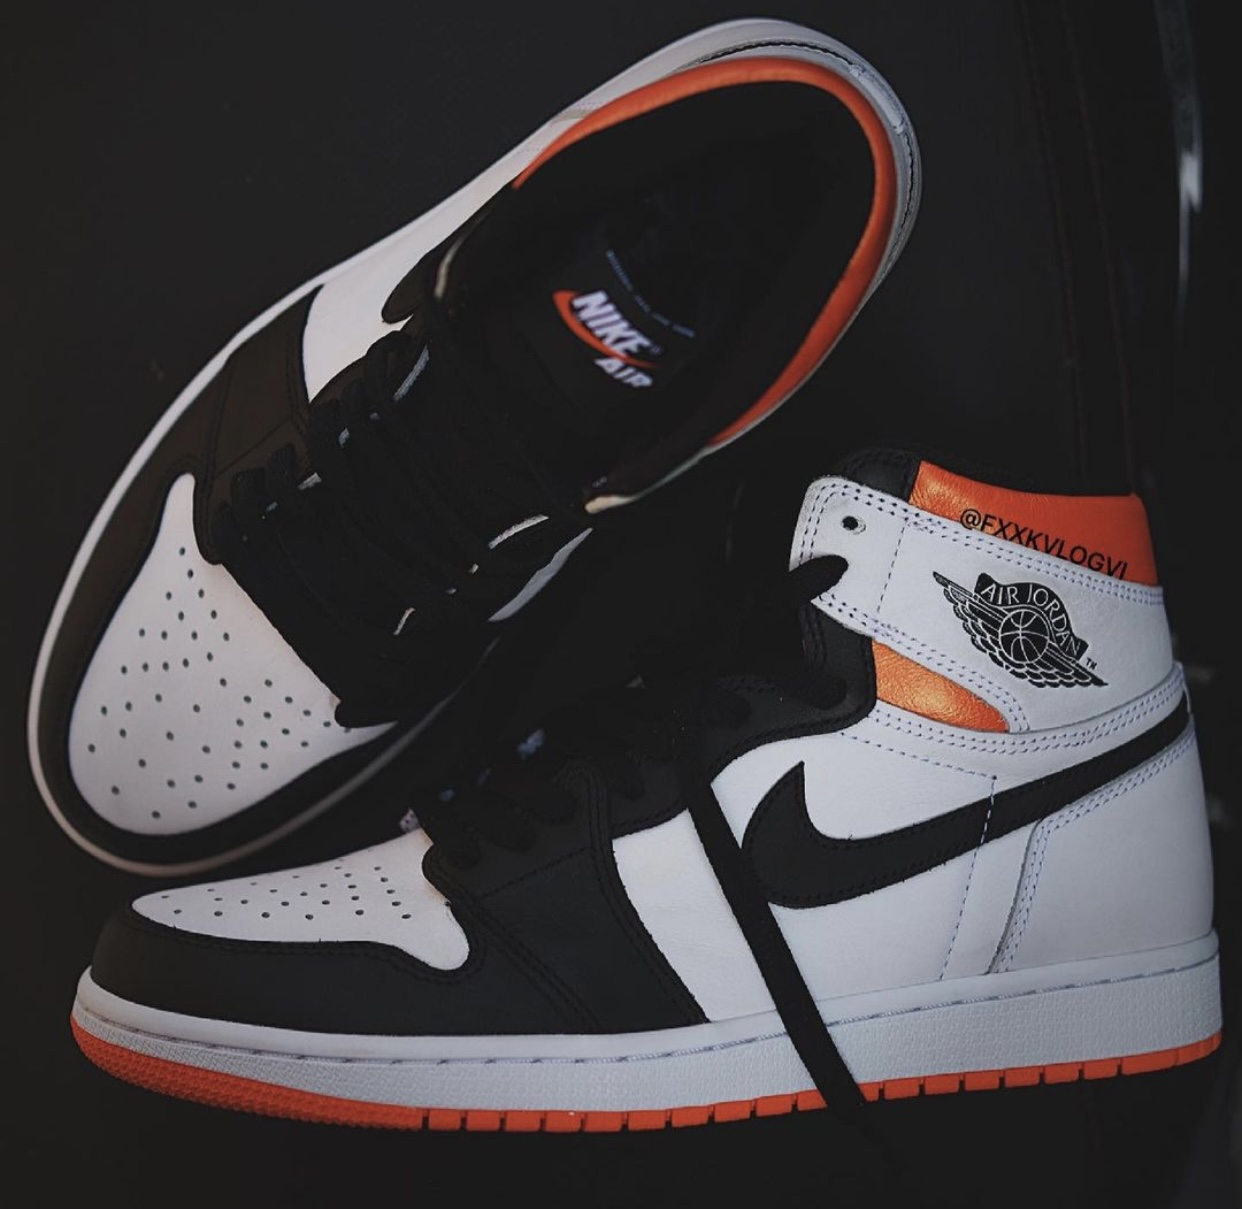 Air Jordan 1 Electro Orange 555088-180 Release Info Price